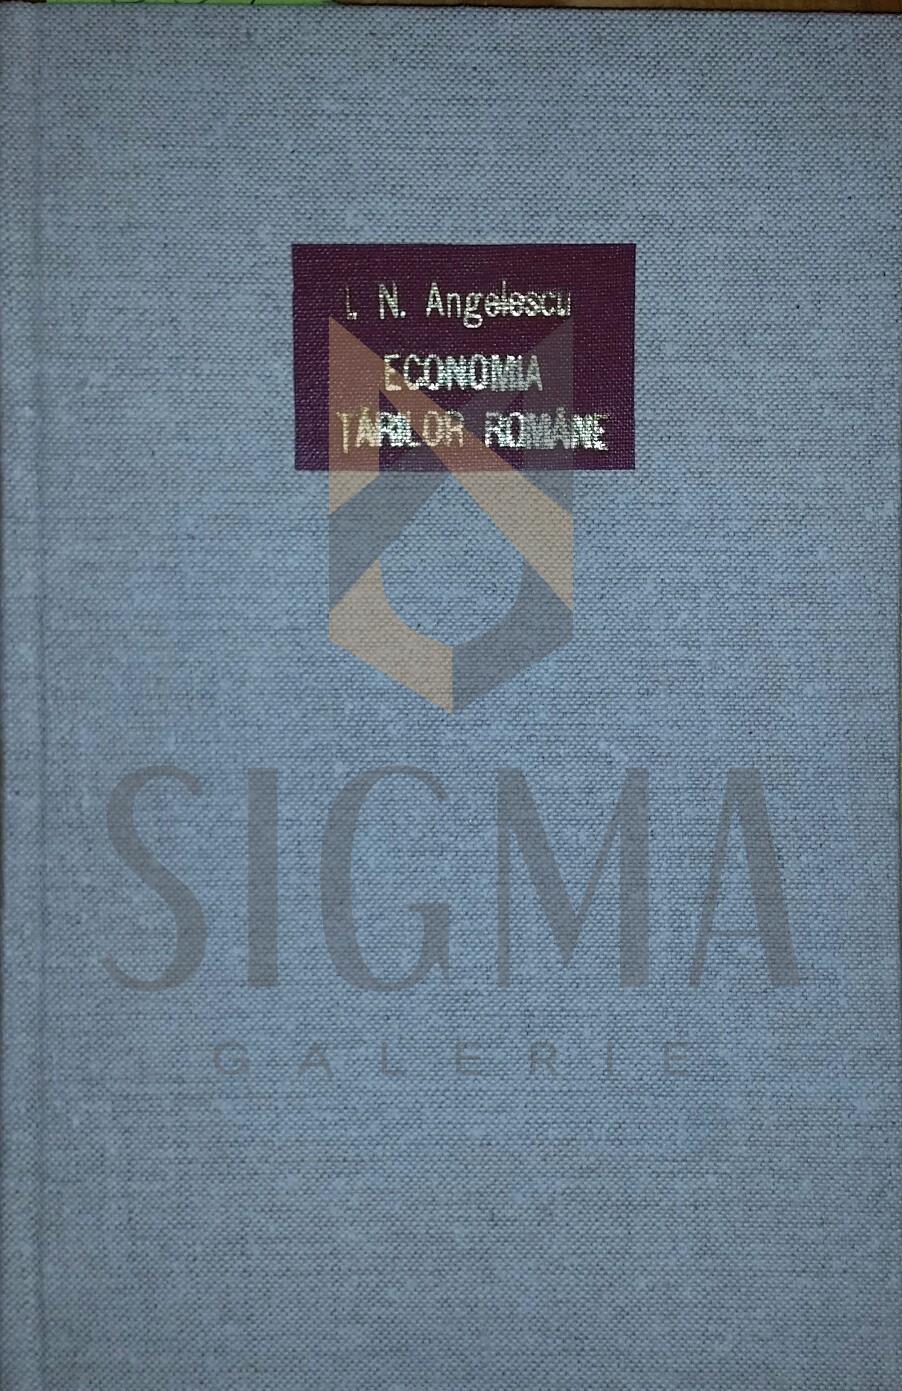 Economia Tarilor Romane vol. 1